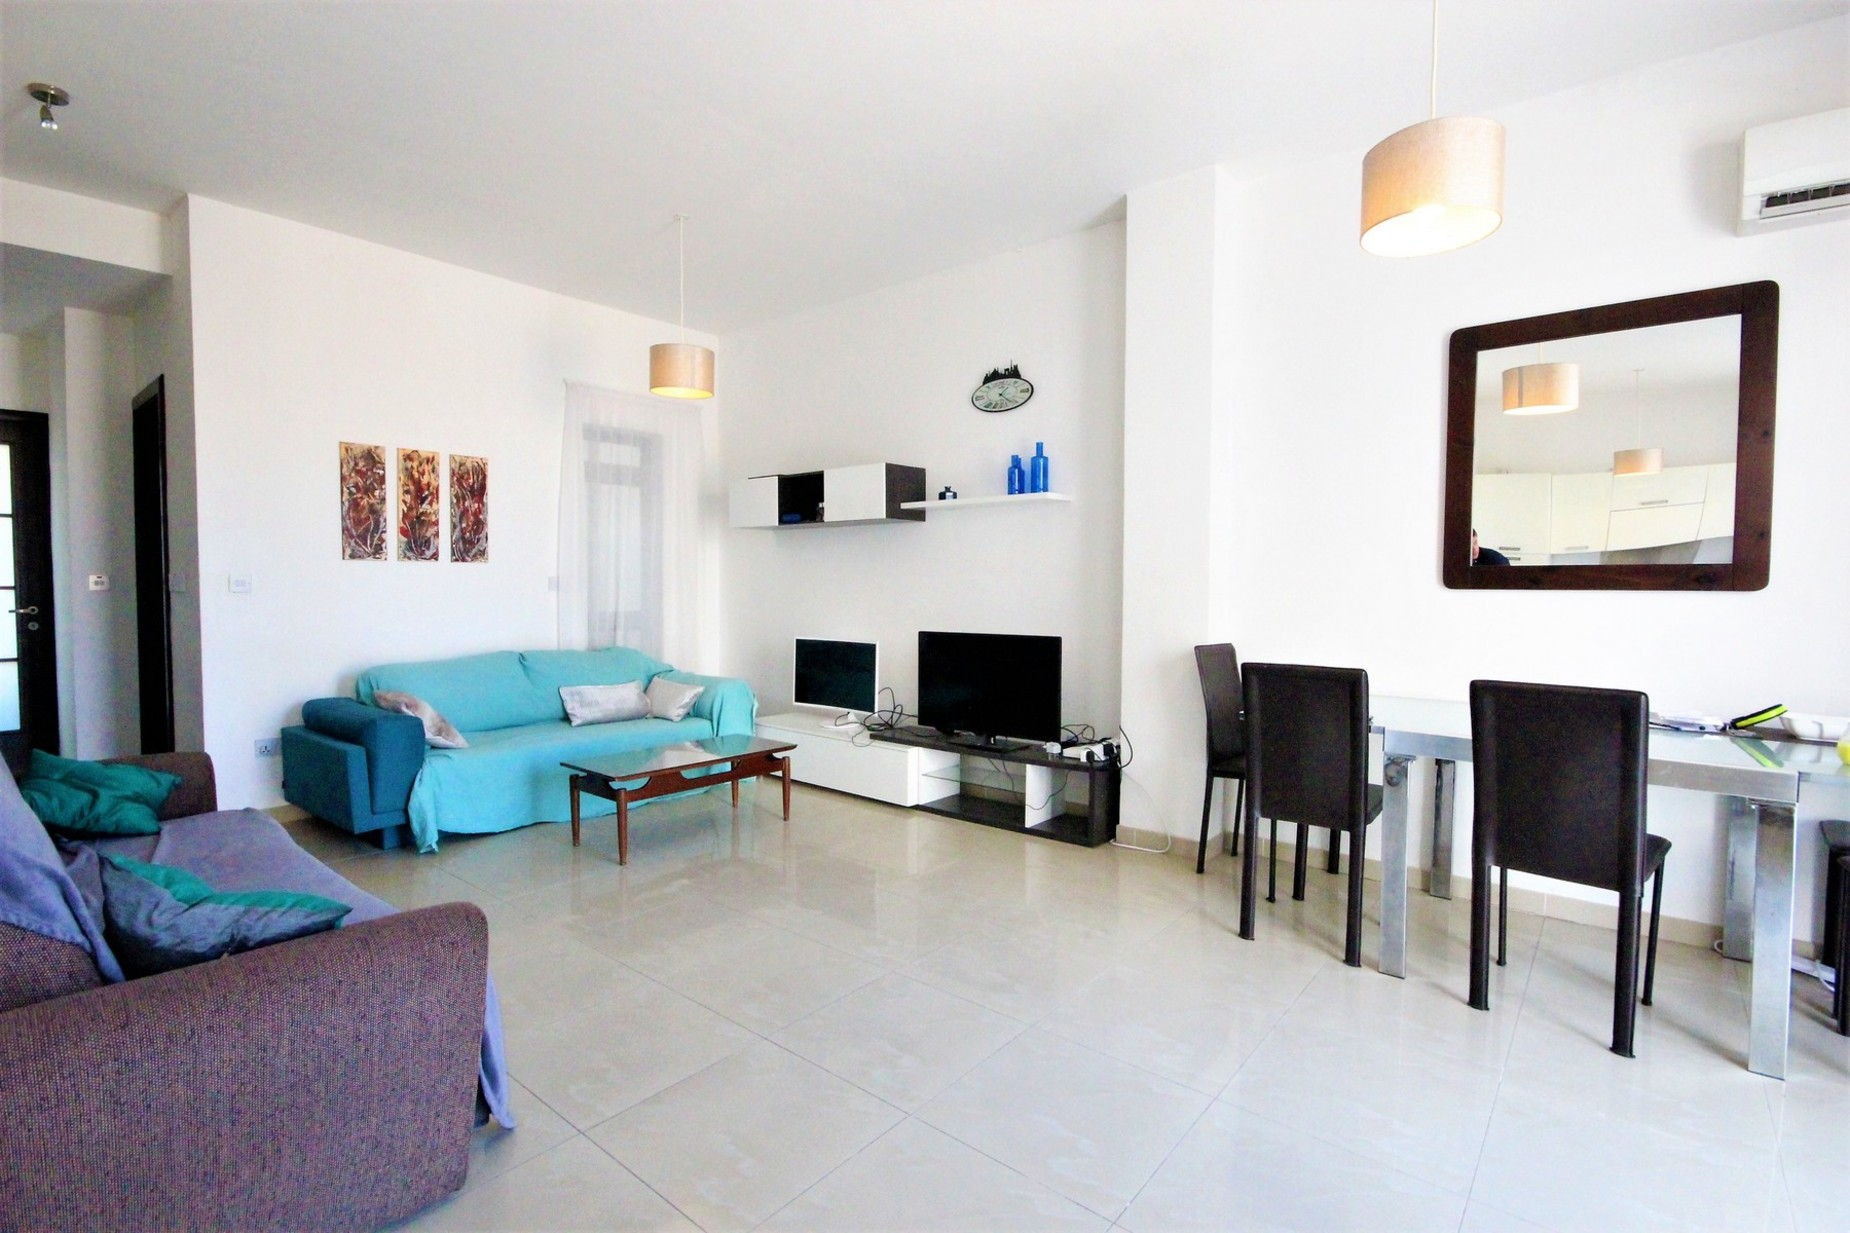 1 bed Apartment For Rent in Sliema, Sliema - thumb 3